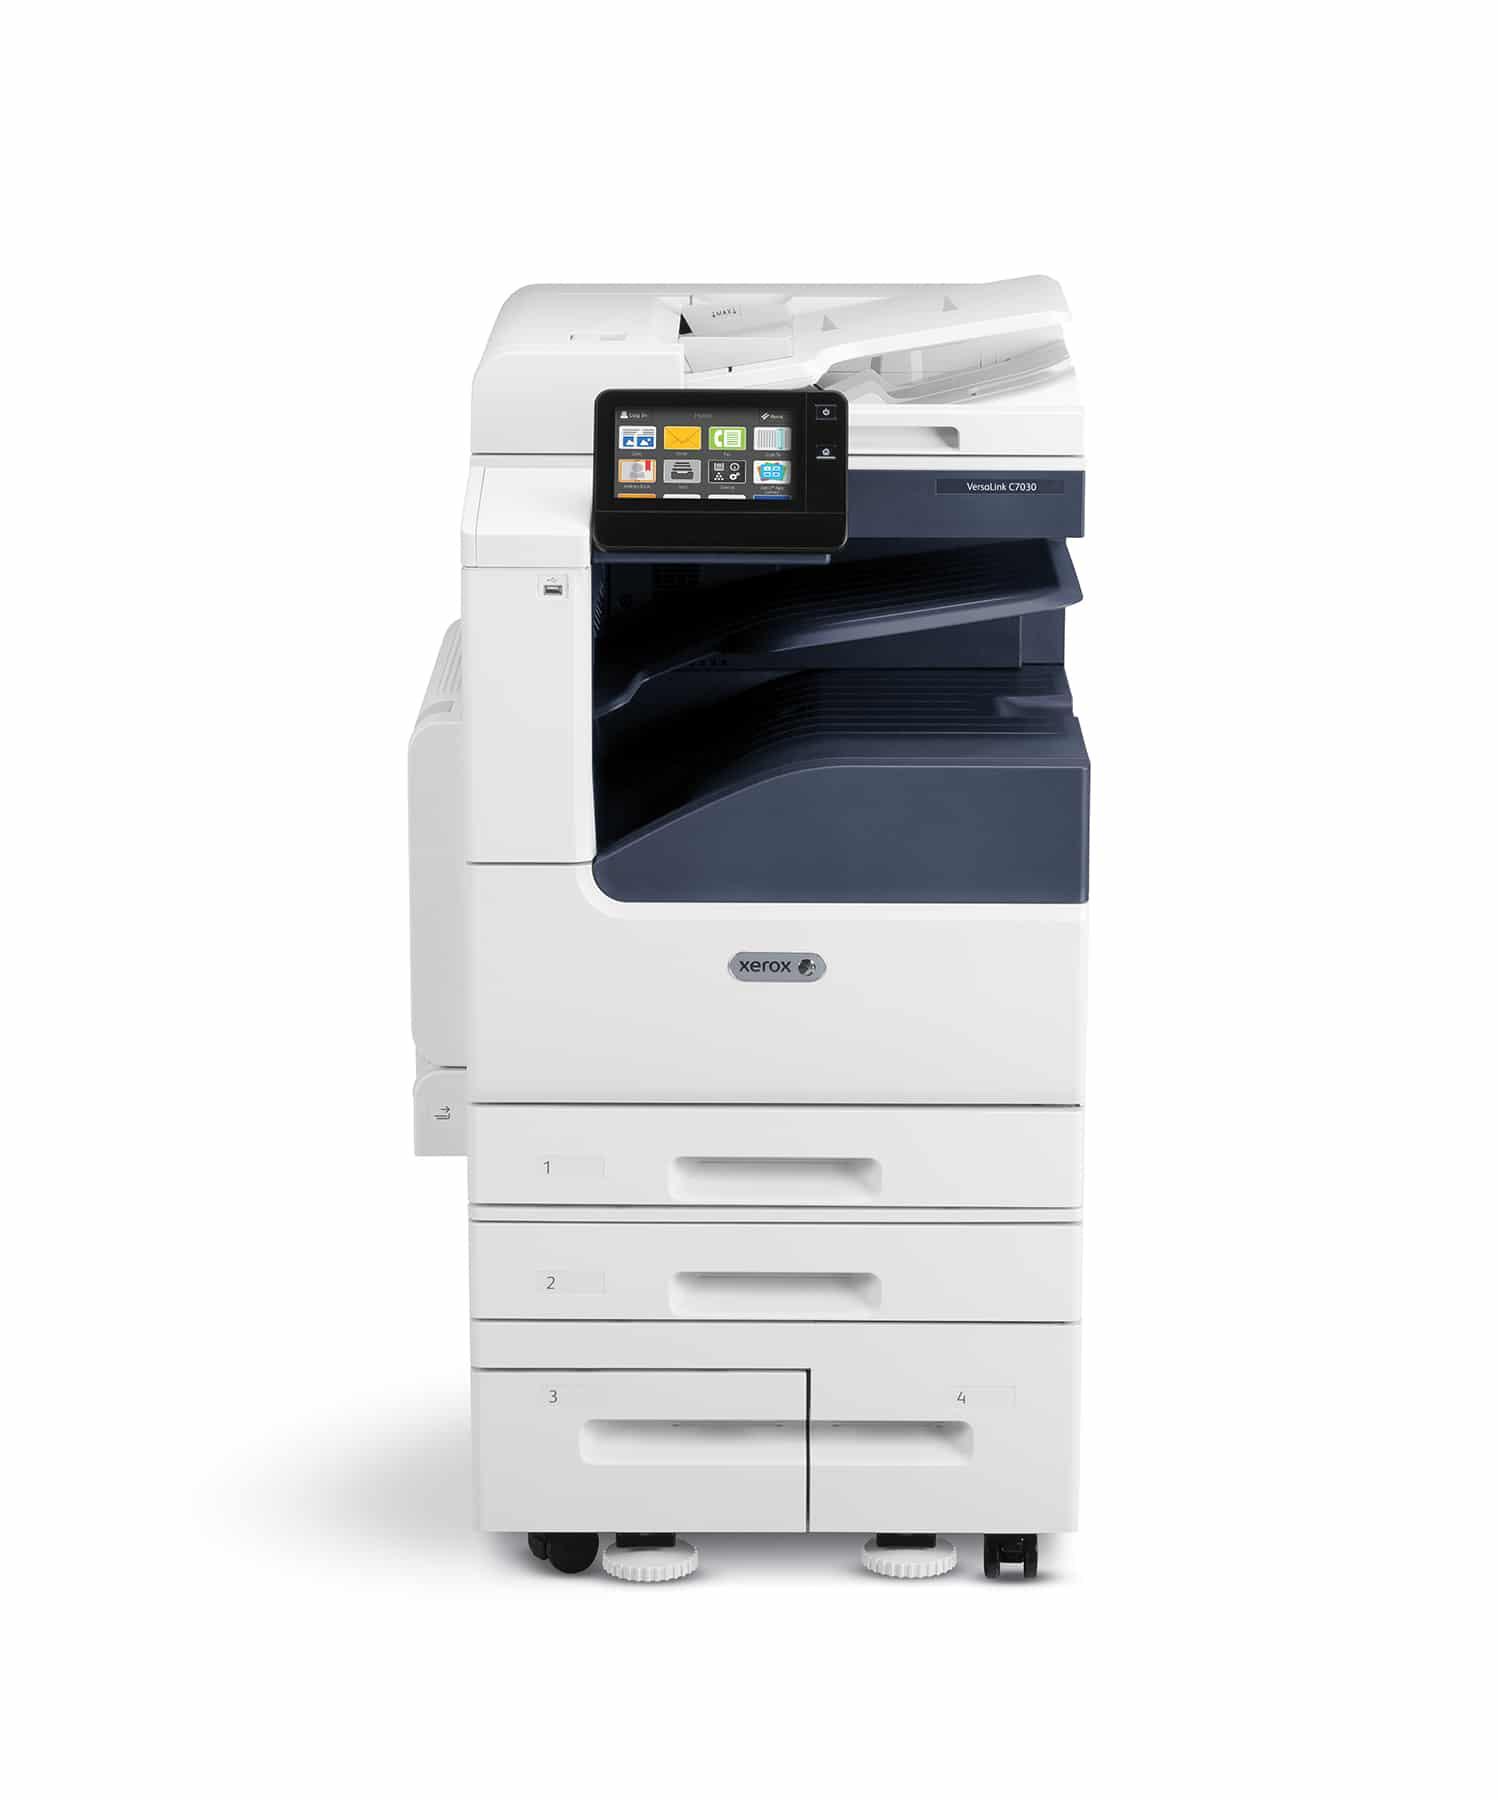 Impresora multifunción Xerox VersaLink C7025